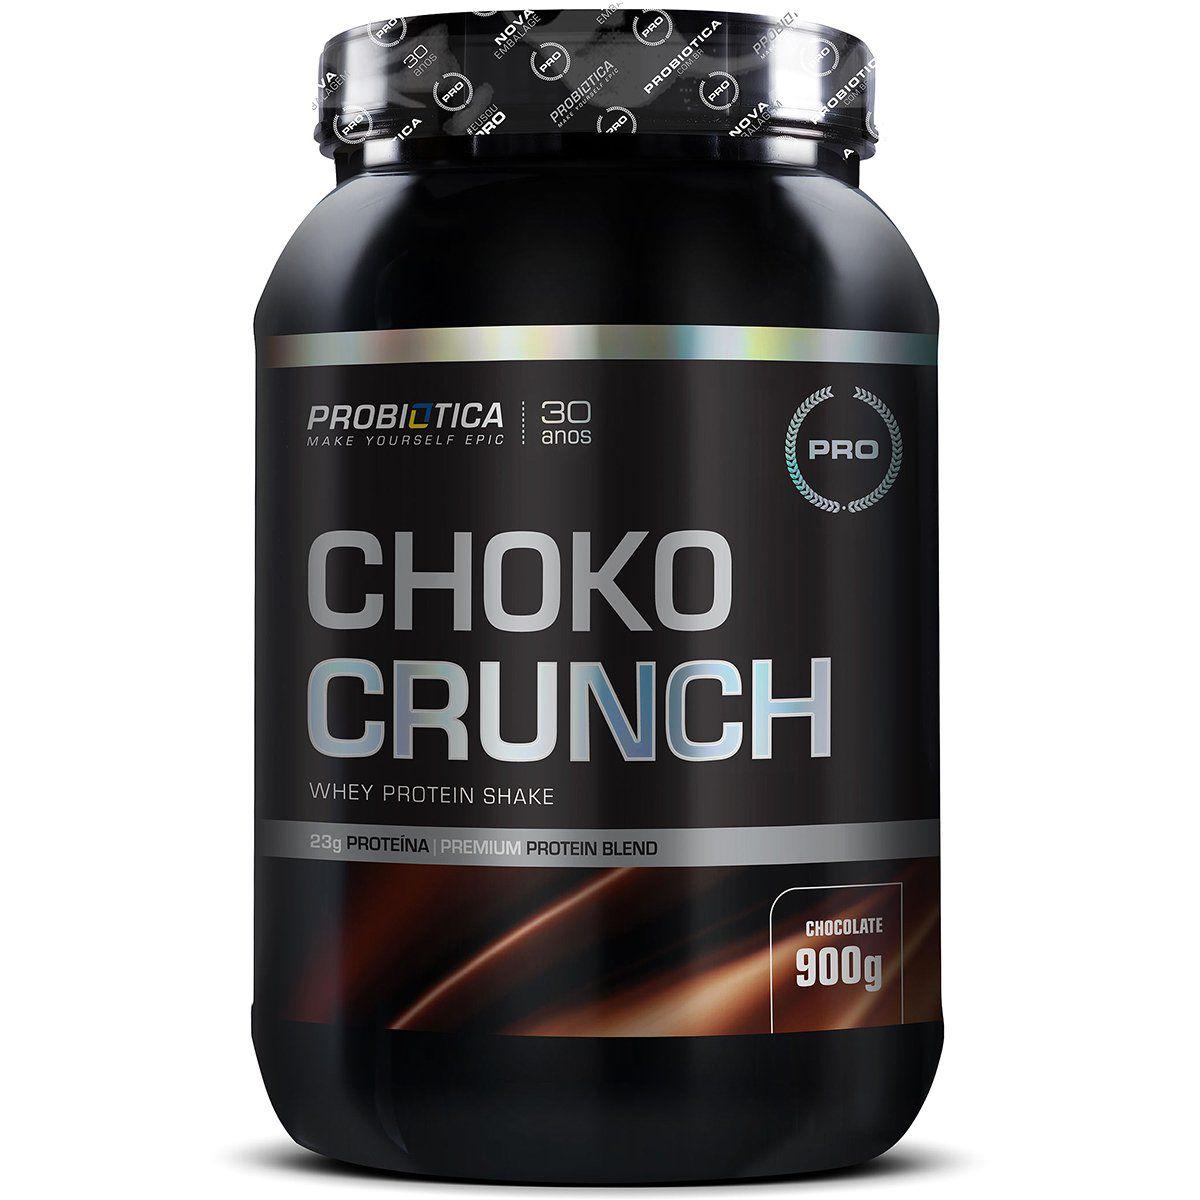 Choko Crunch Whey Protein Shake 900g Probiótica